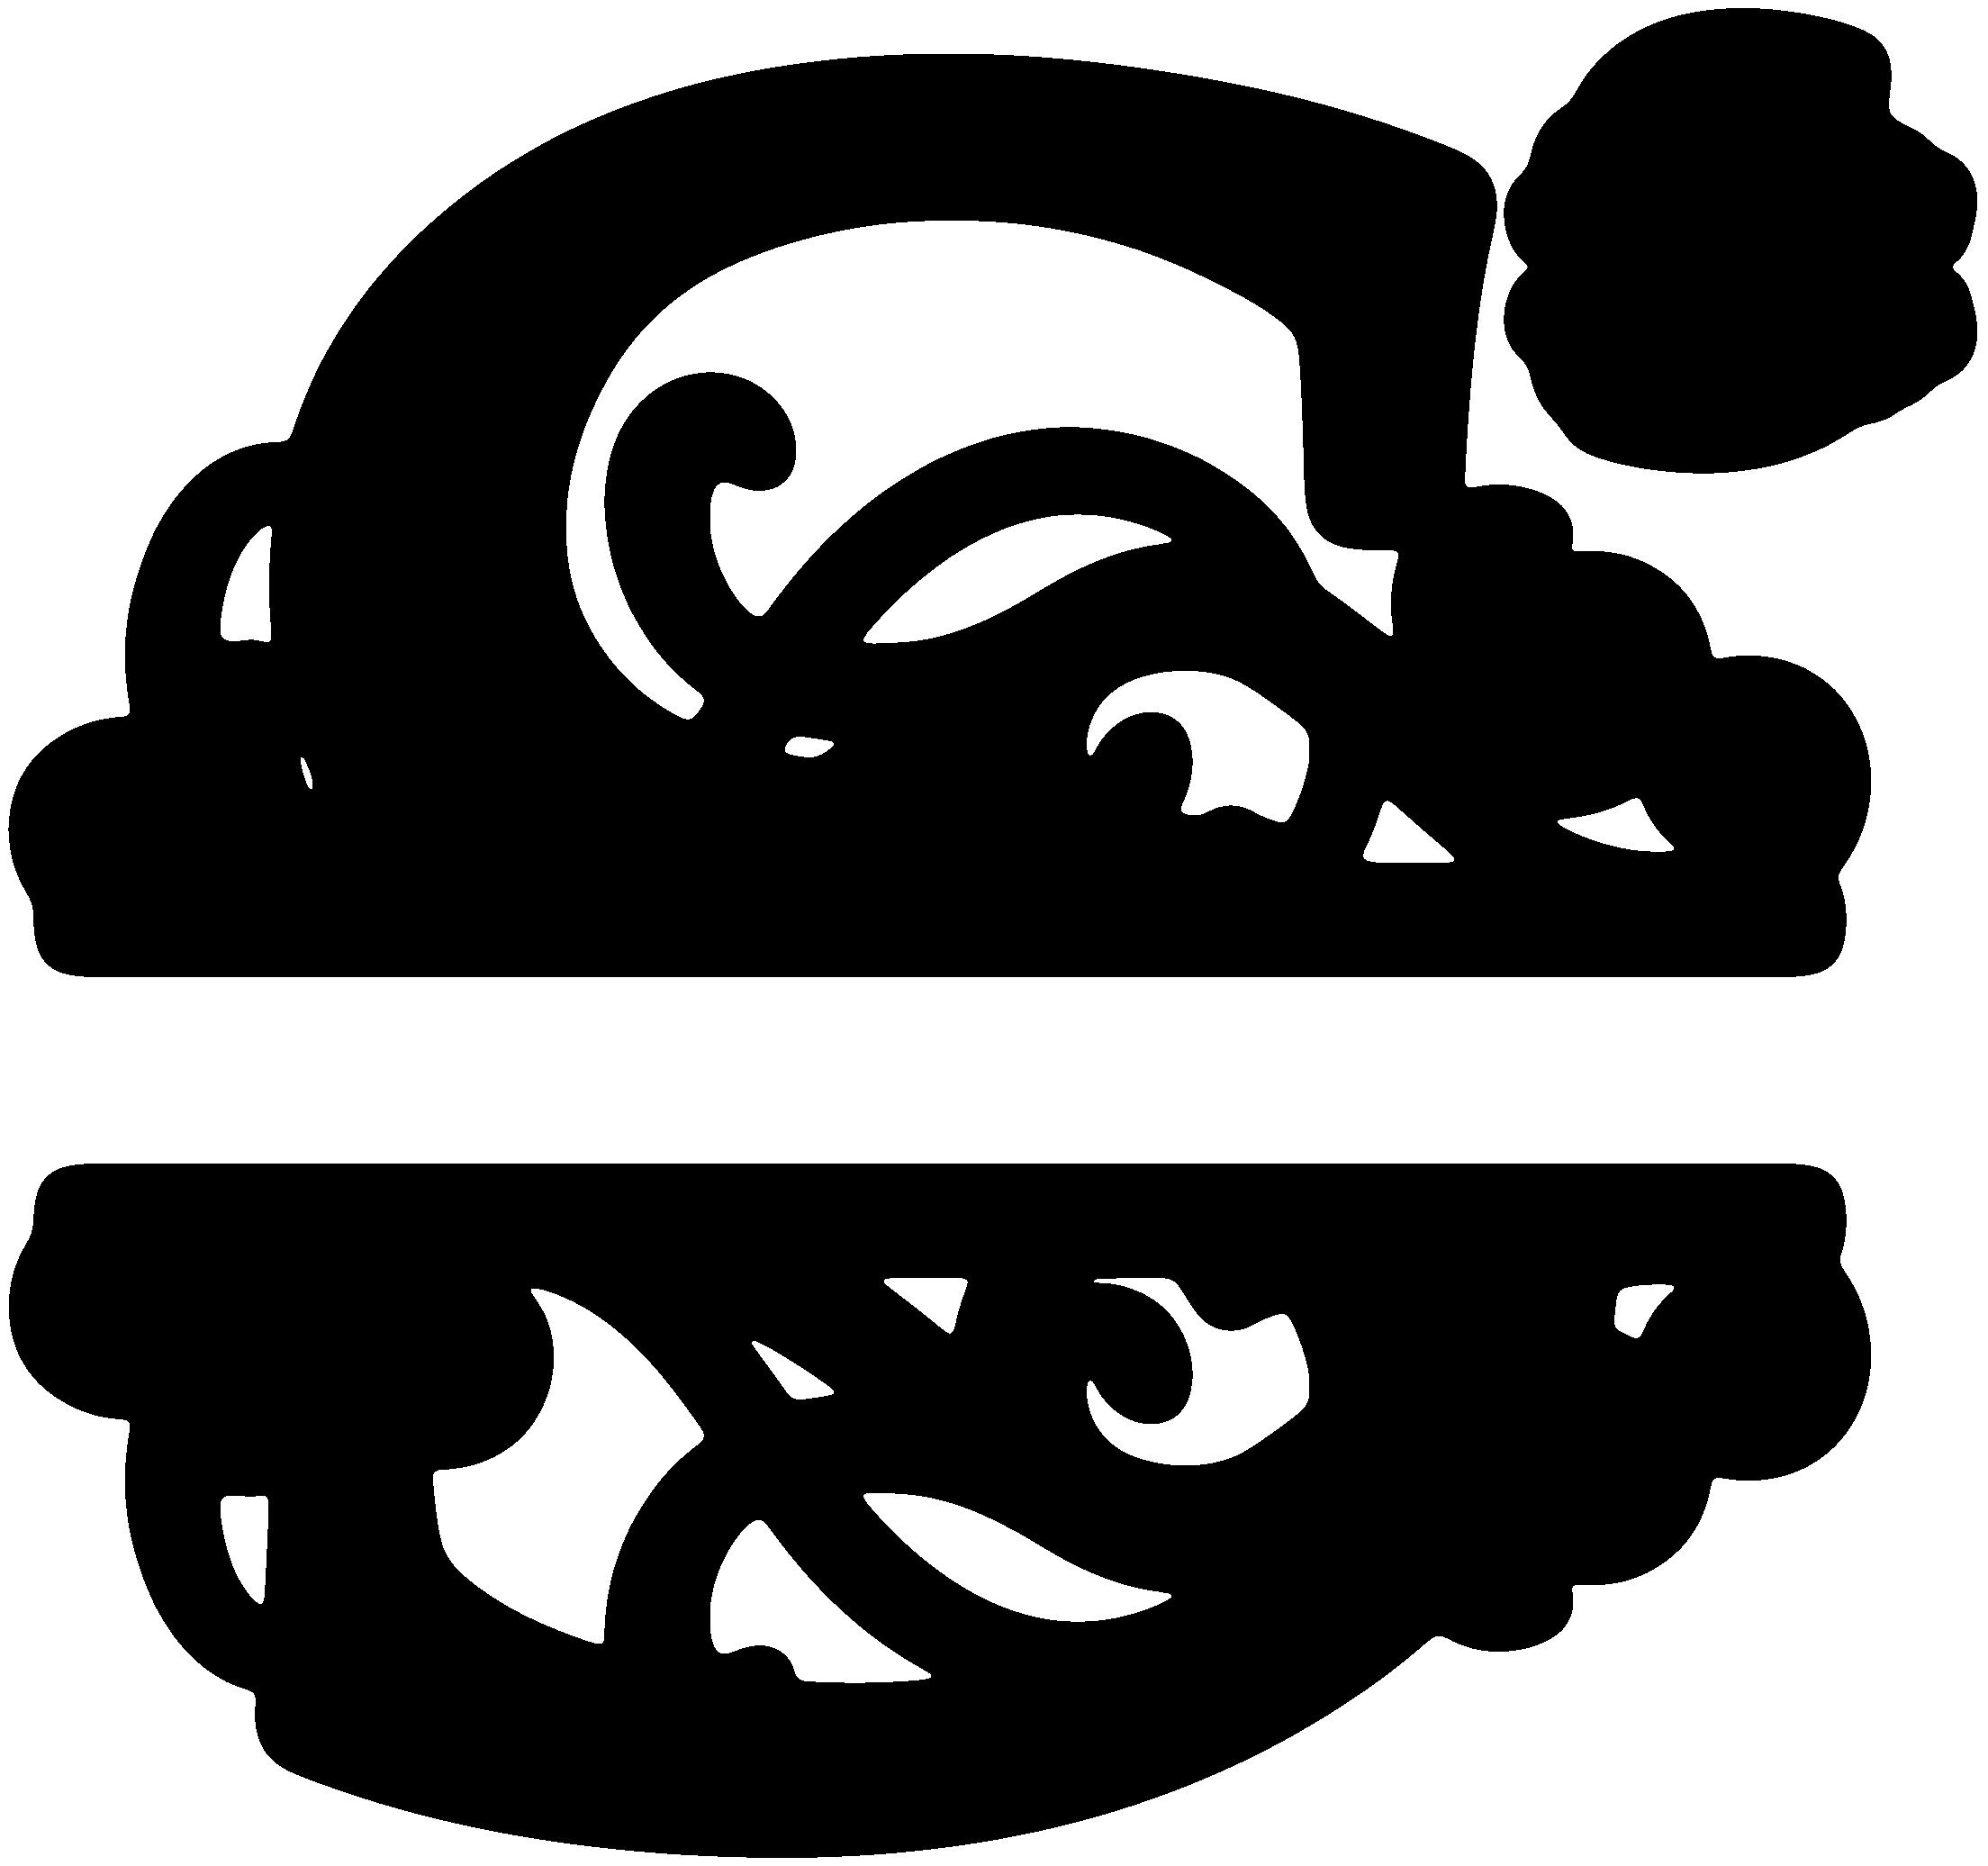 S monogram clipart free png download K Monogram Alphabet Clipart - Clipart Kid png download